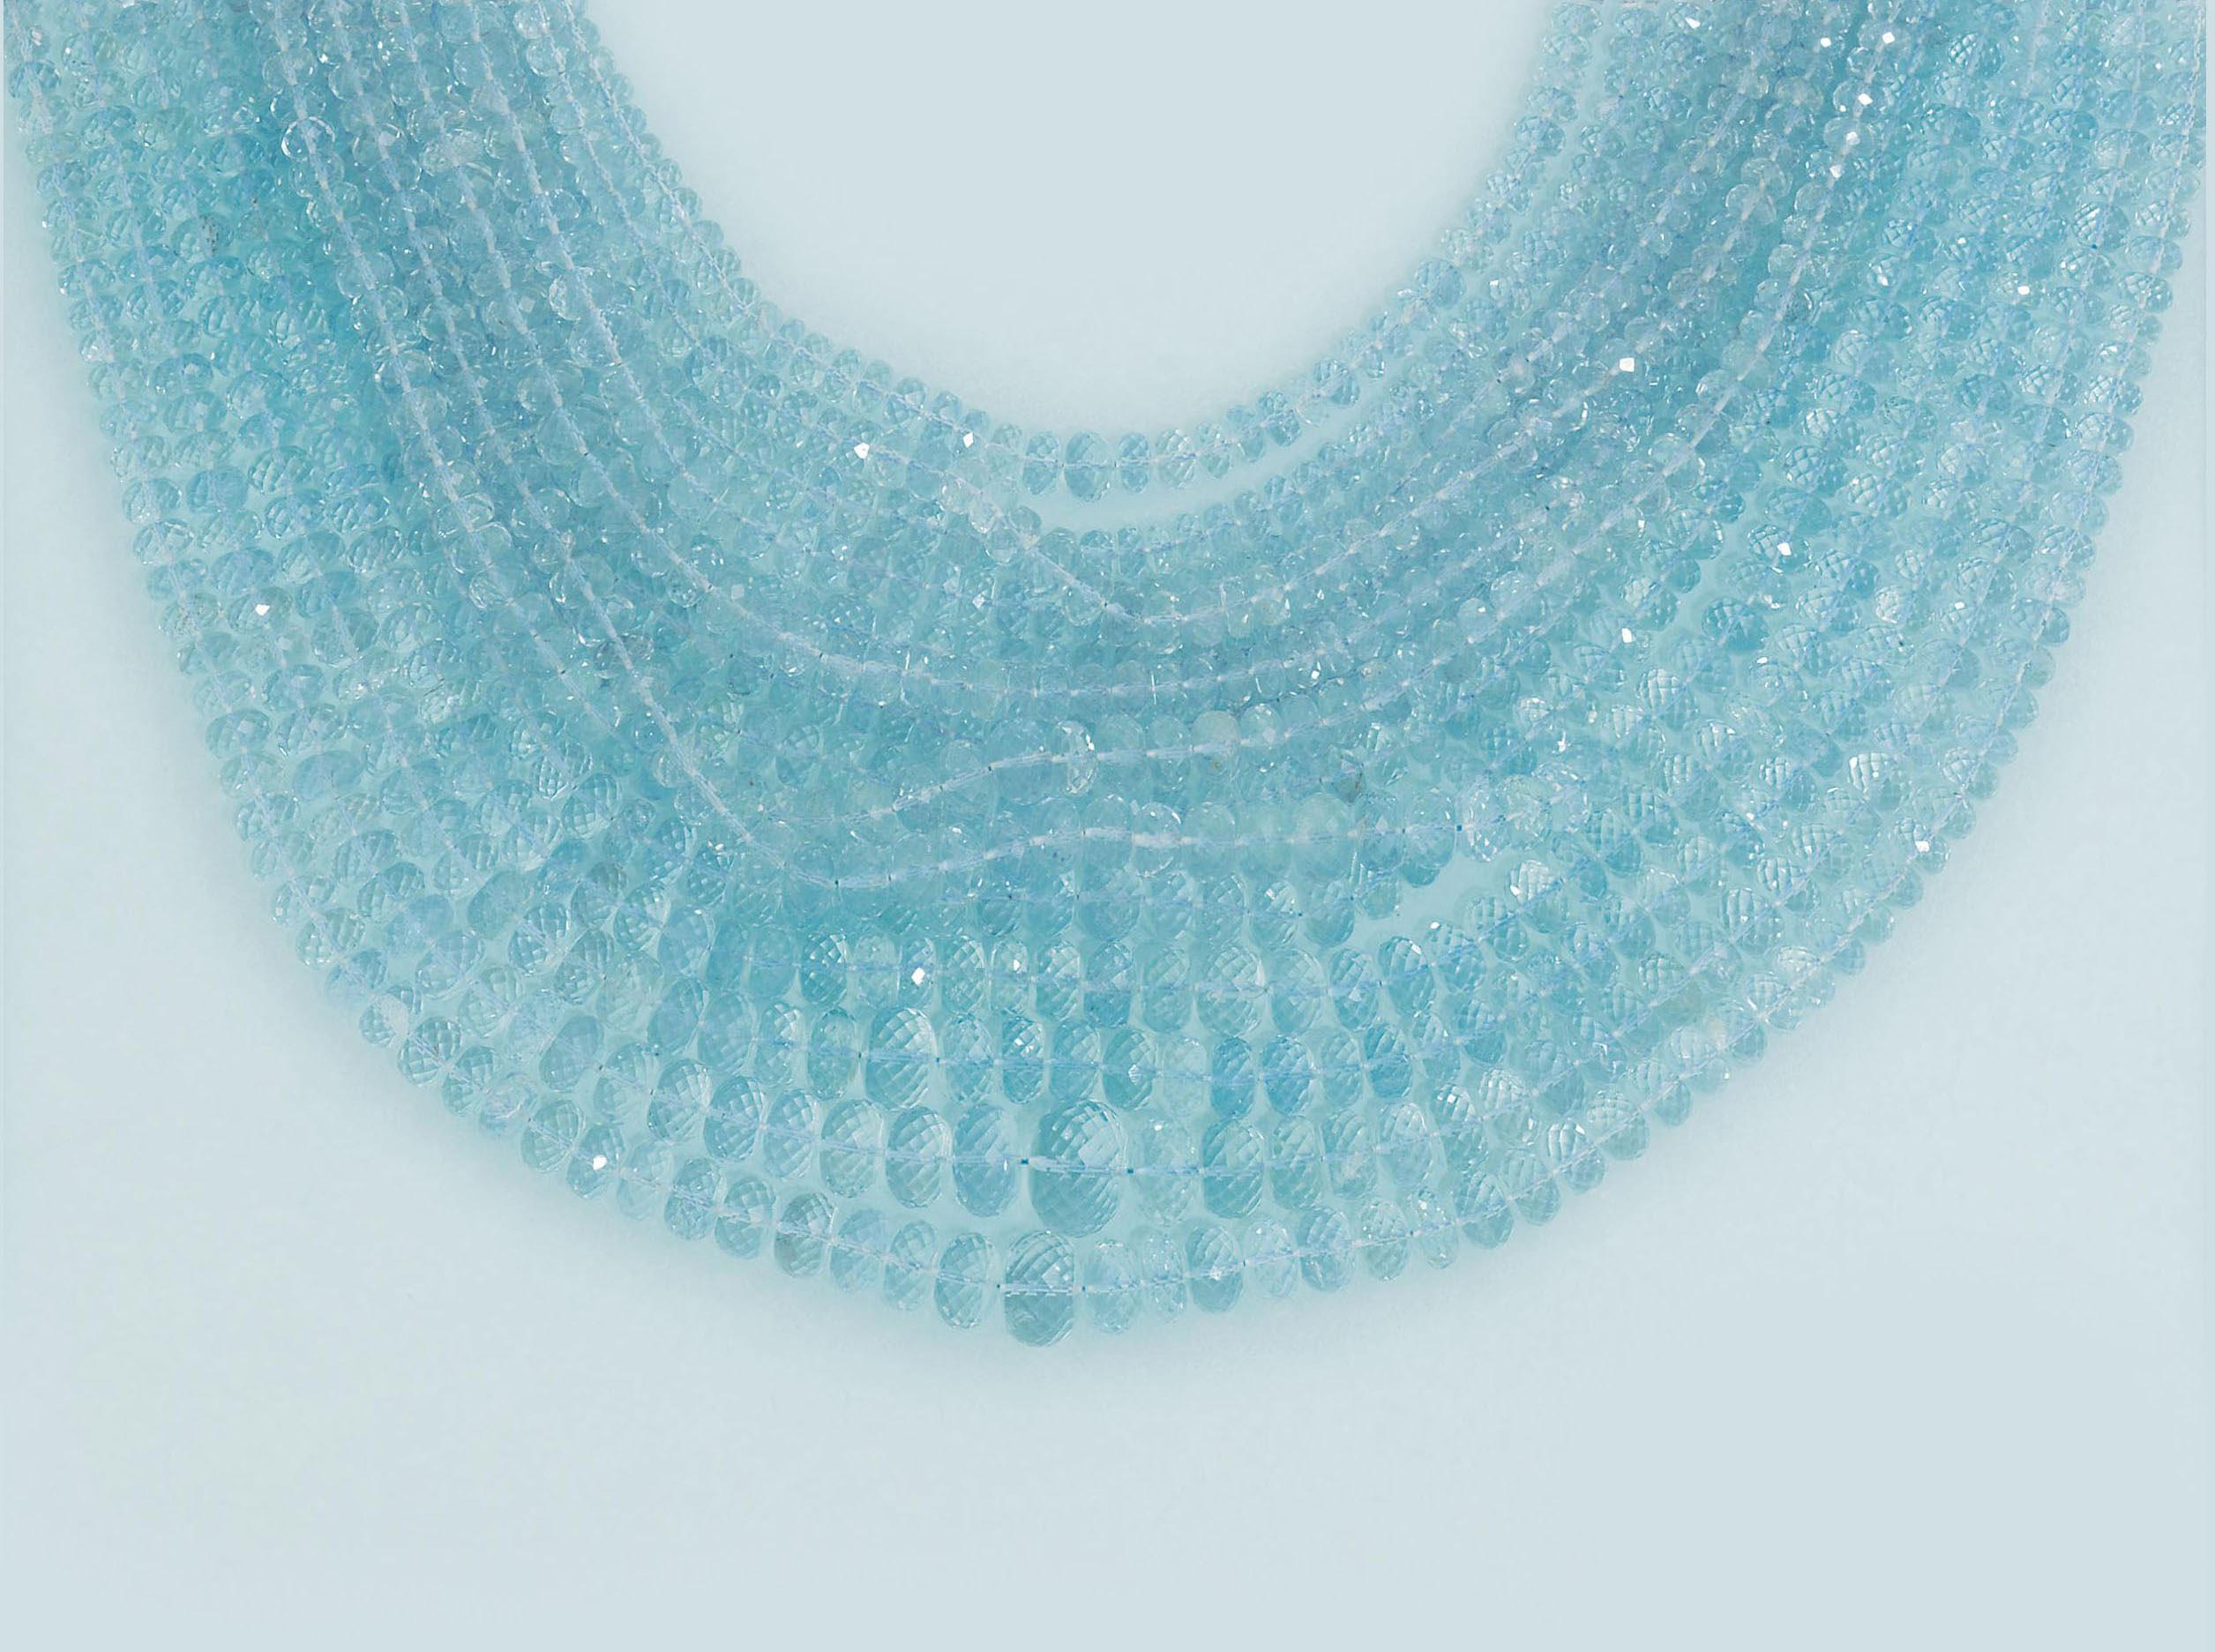 An aquamarine necklace